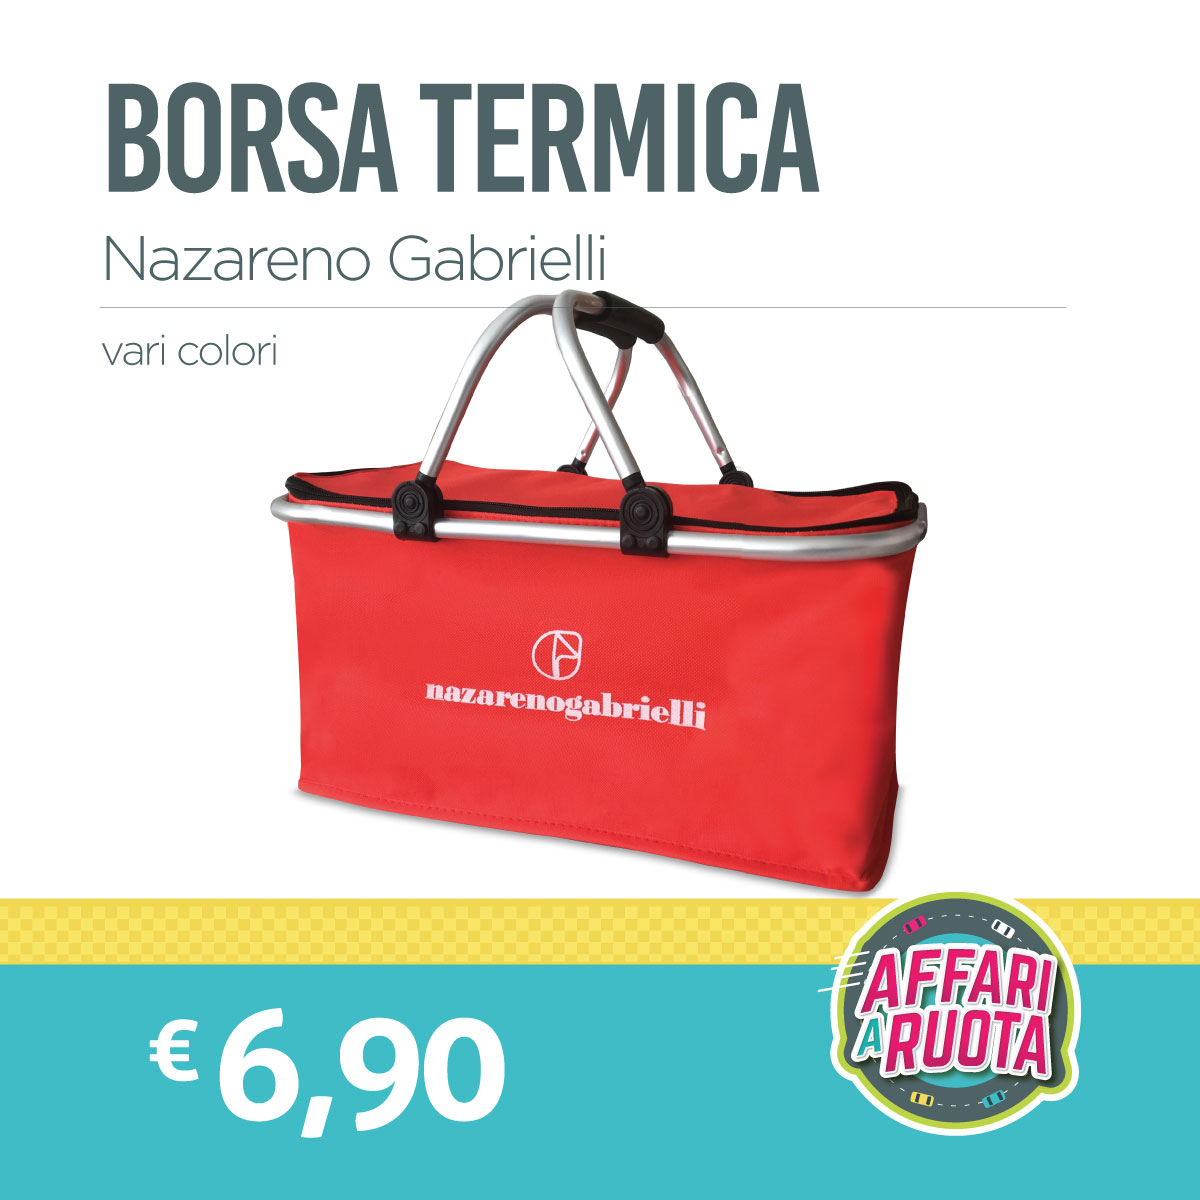 Borsa termica Nazareno Gabrielli